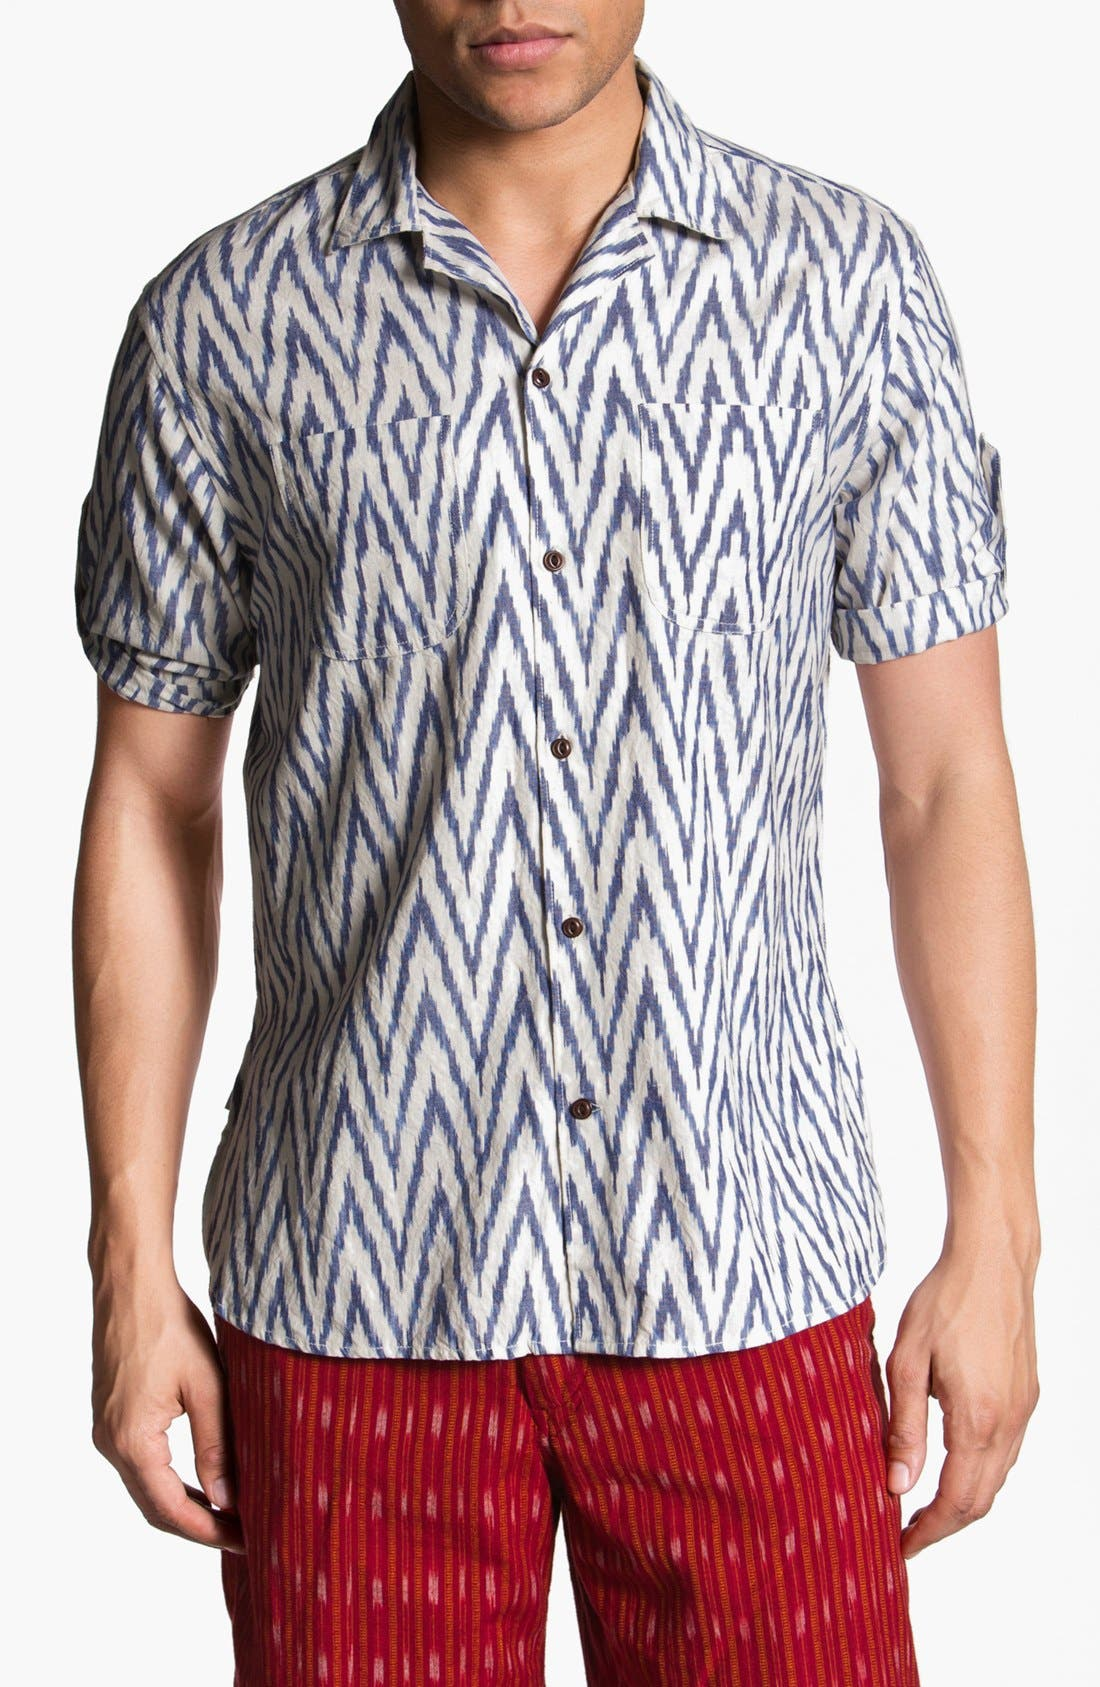 Main Image - Burkman Bros Short Sleeve Campshirt